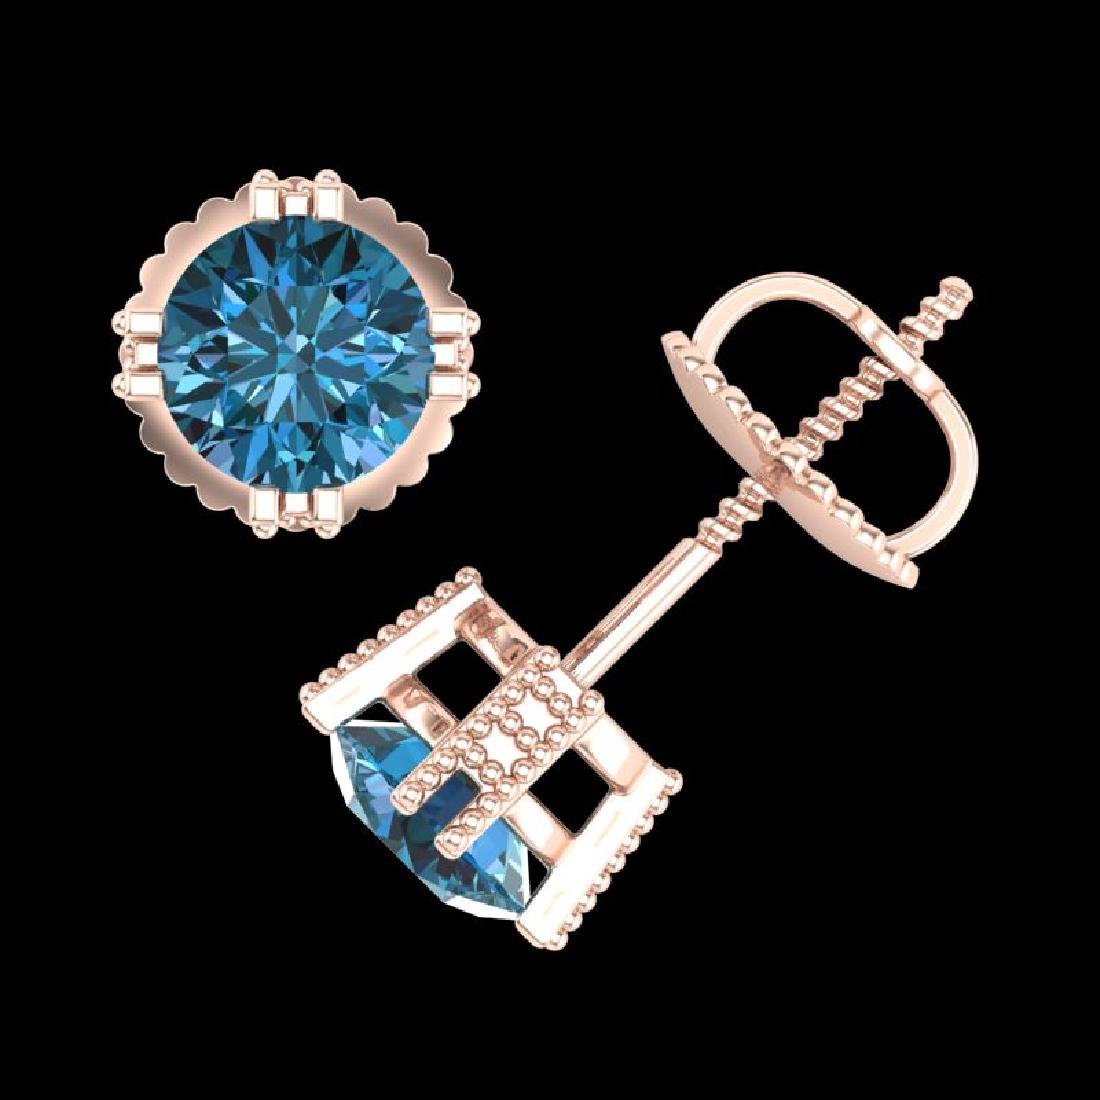 1.07 CTW Fancy Intense Blue Diamond Art Deco Stud - 3